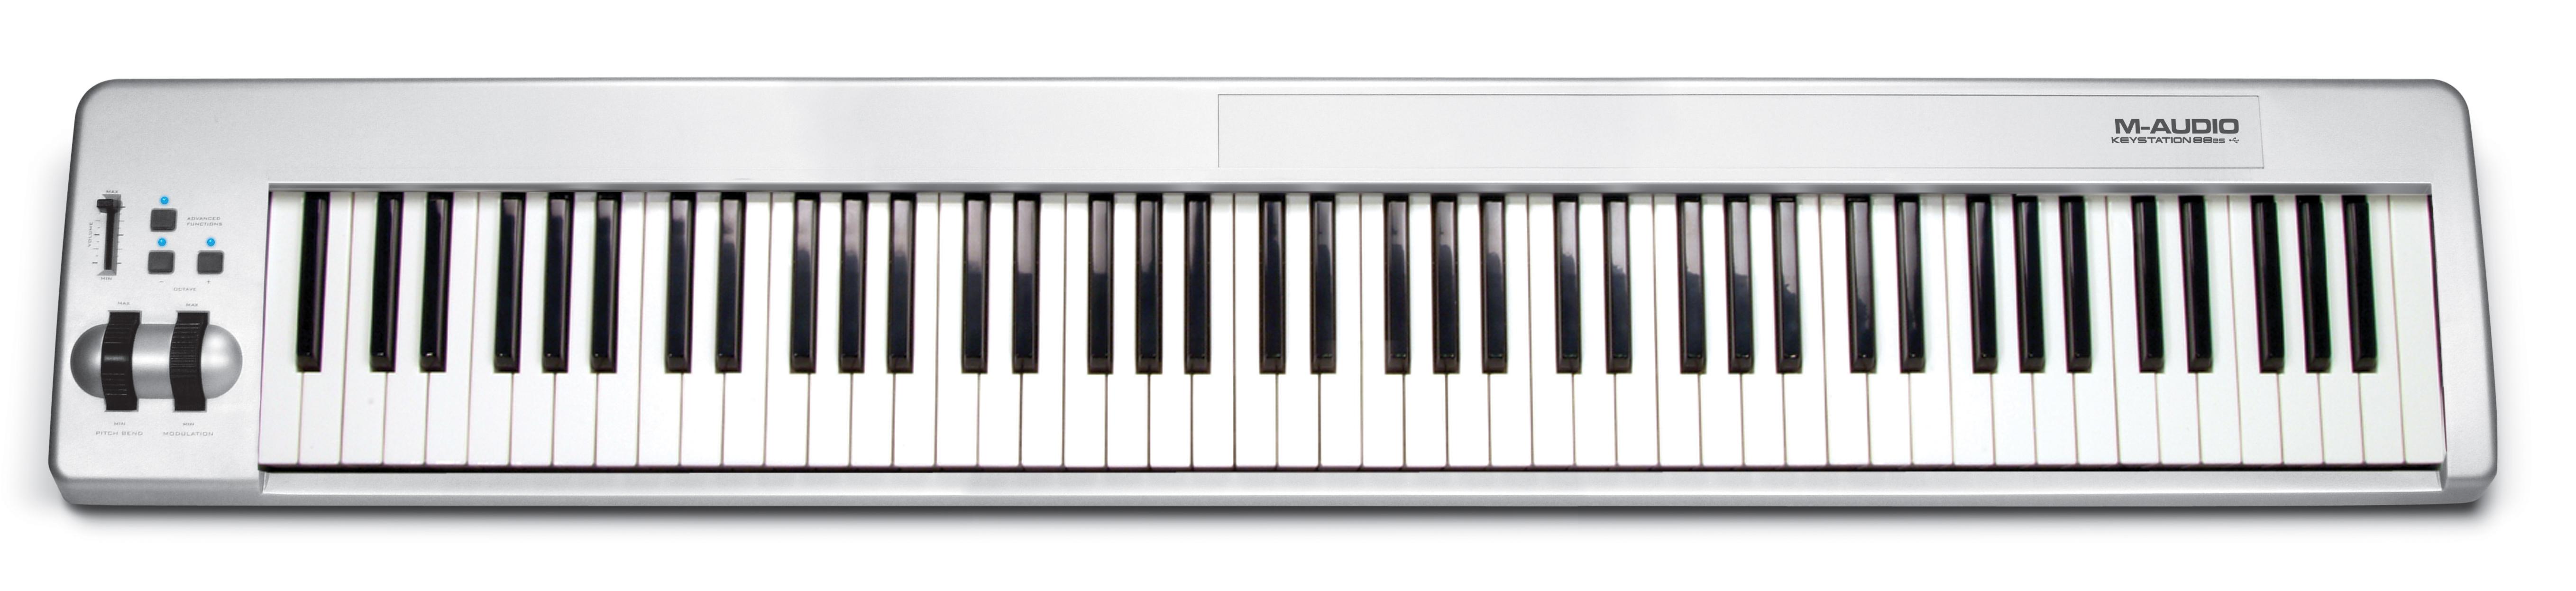 m audio keystation 88es usb midi keyboard. Black Bedroom Furniture Sets. Home Design Ideas